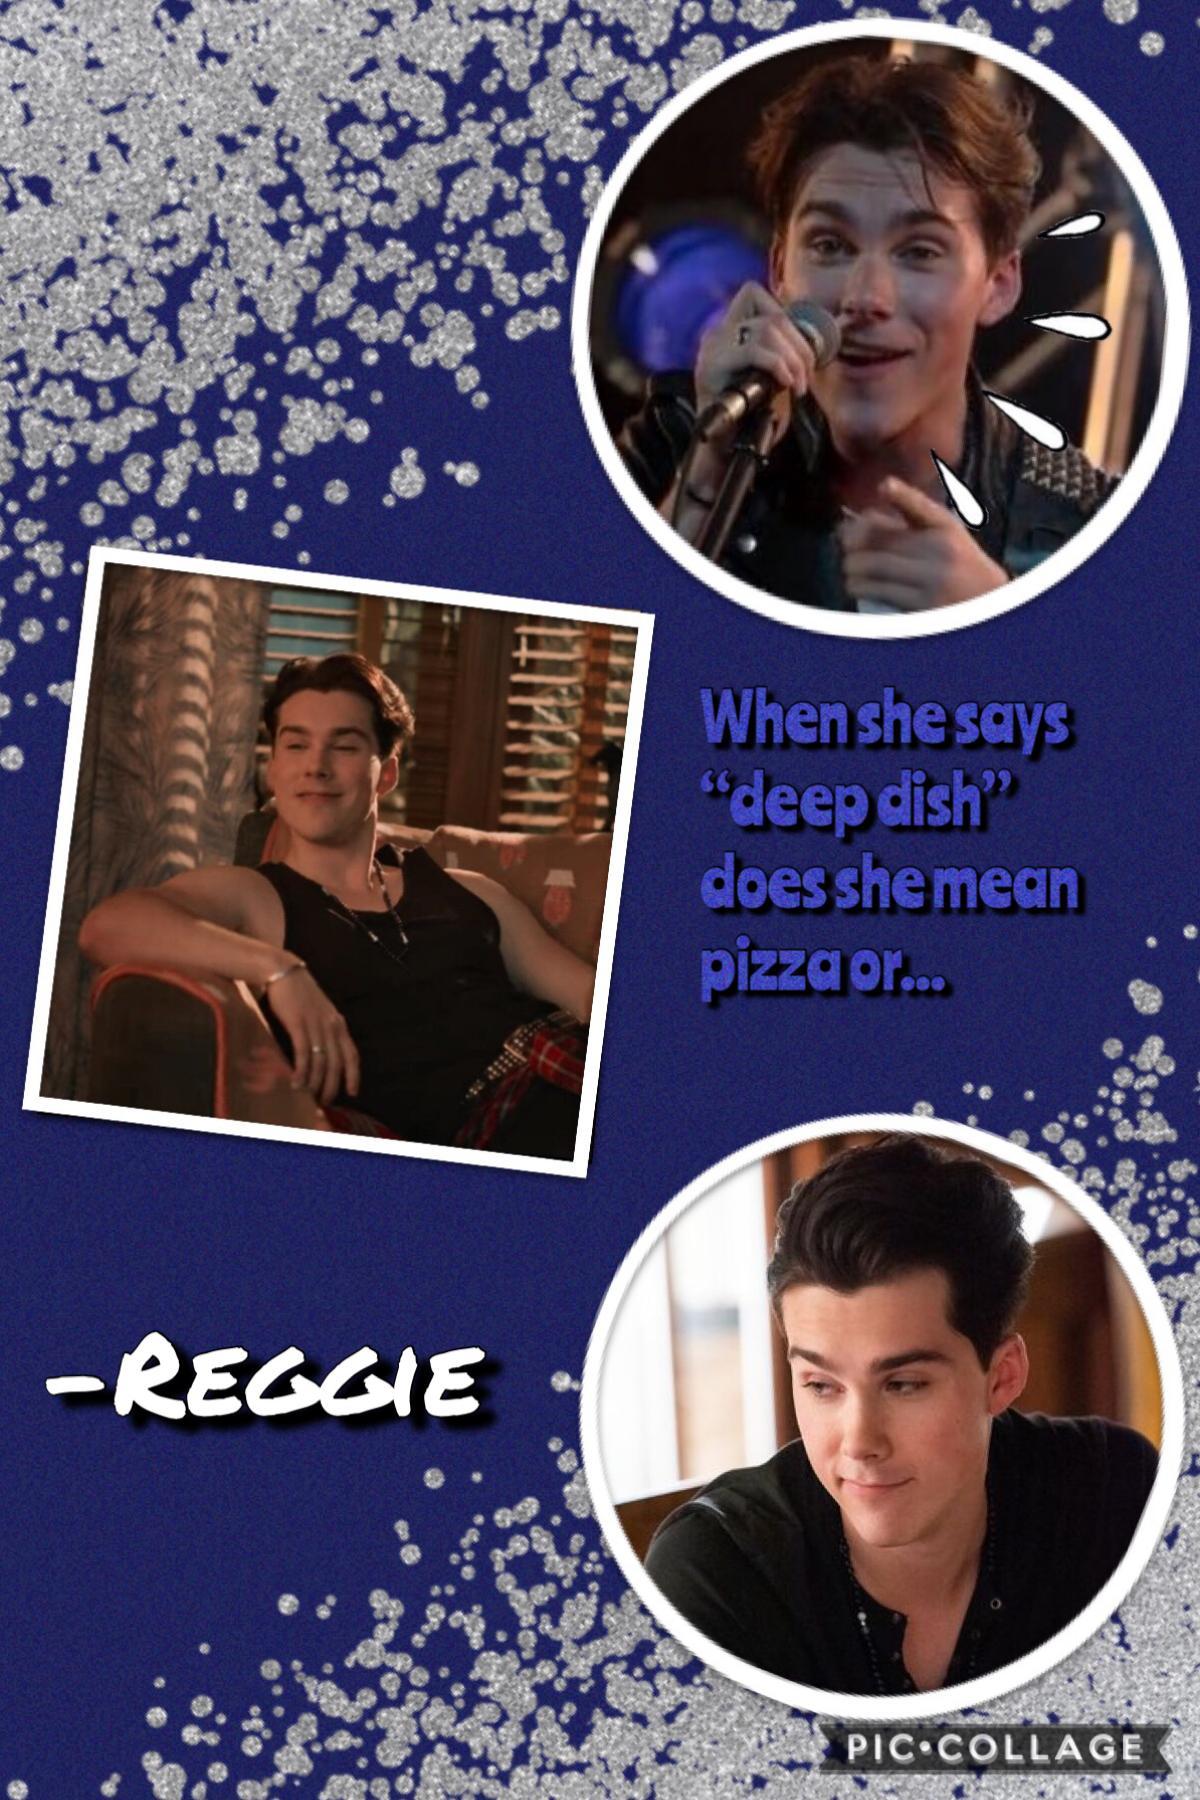 Reggie Sorry I forgot to upload. This is Thursday's post